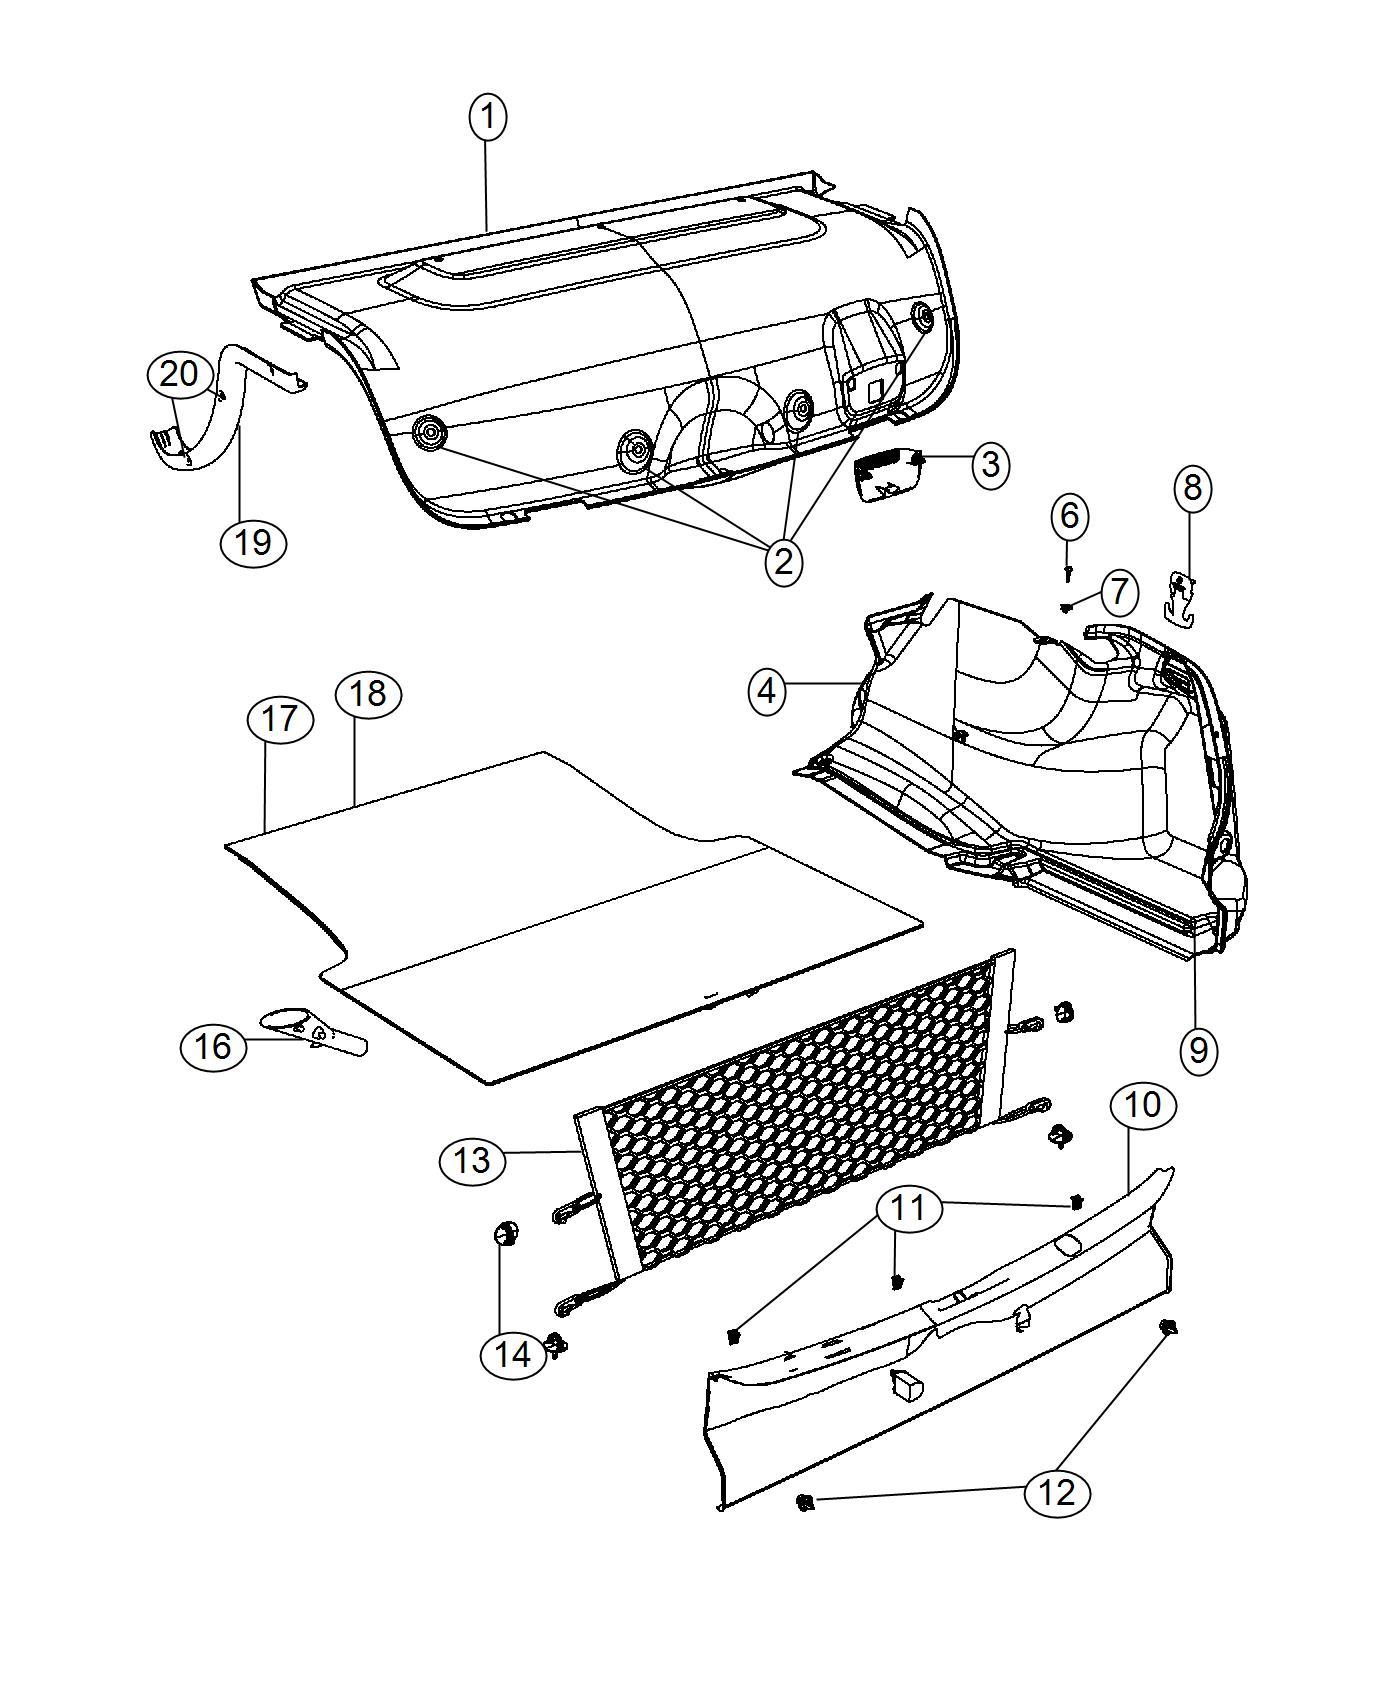 2017 Chrysler 300 Door. Fuel filler manual access